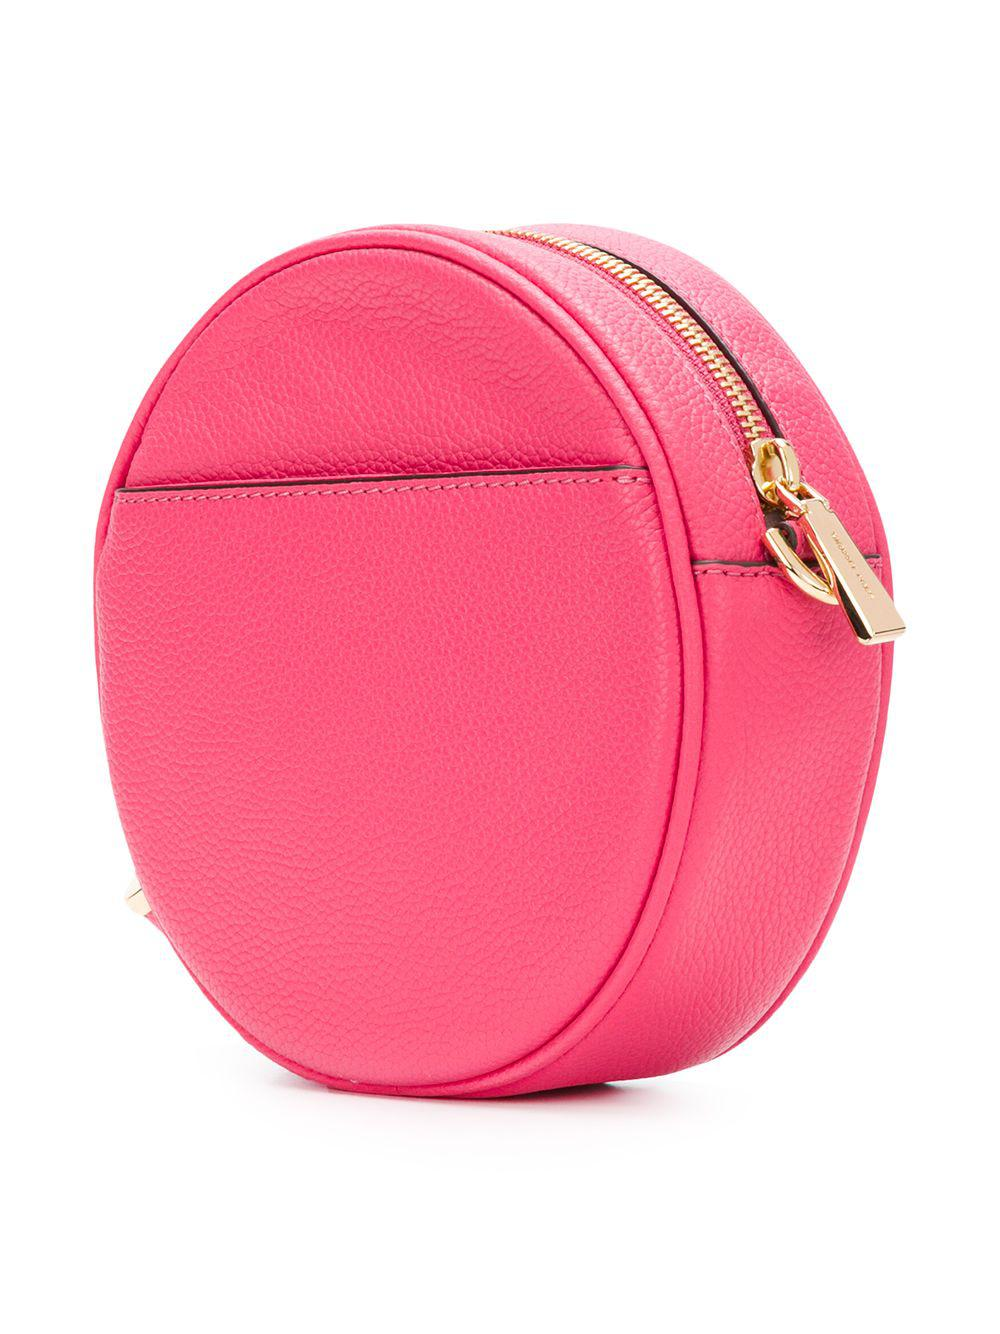 a5f43d5e7e87 Lyst - MICHAEL Michael Kors Mercer Medium Canteen Crossbody Bag in Pink